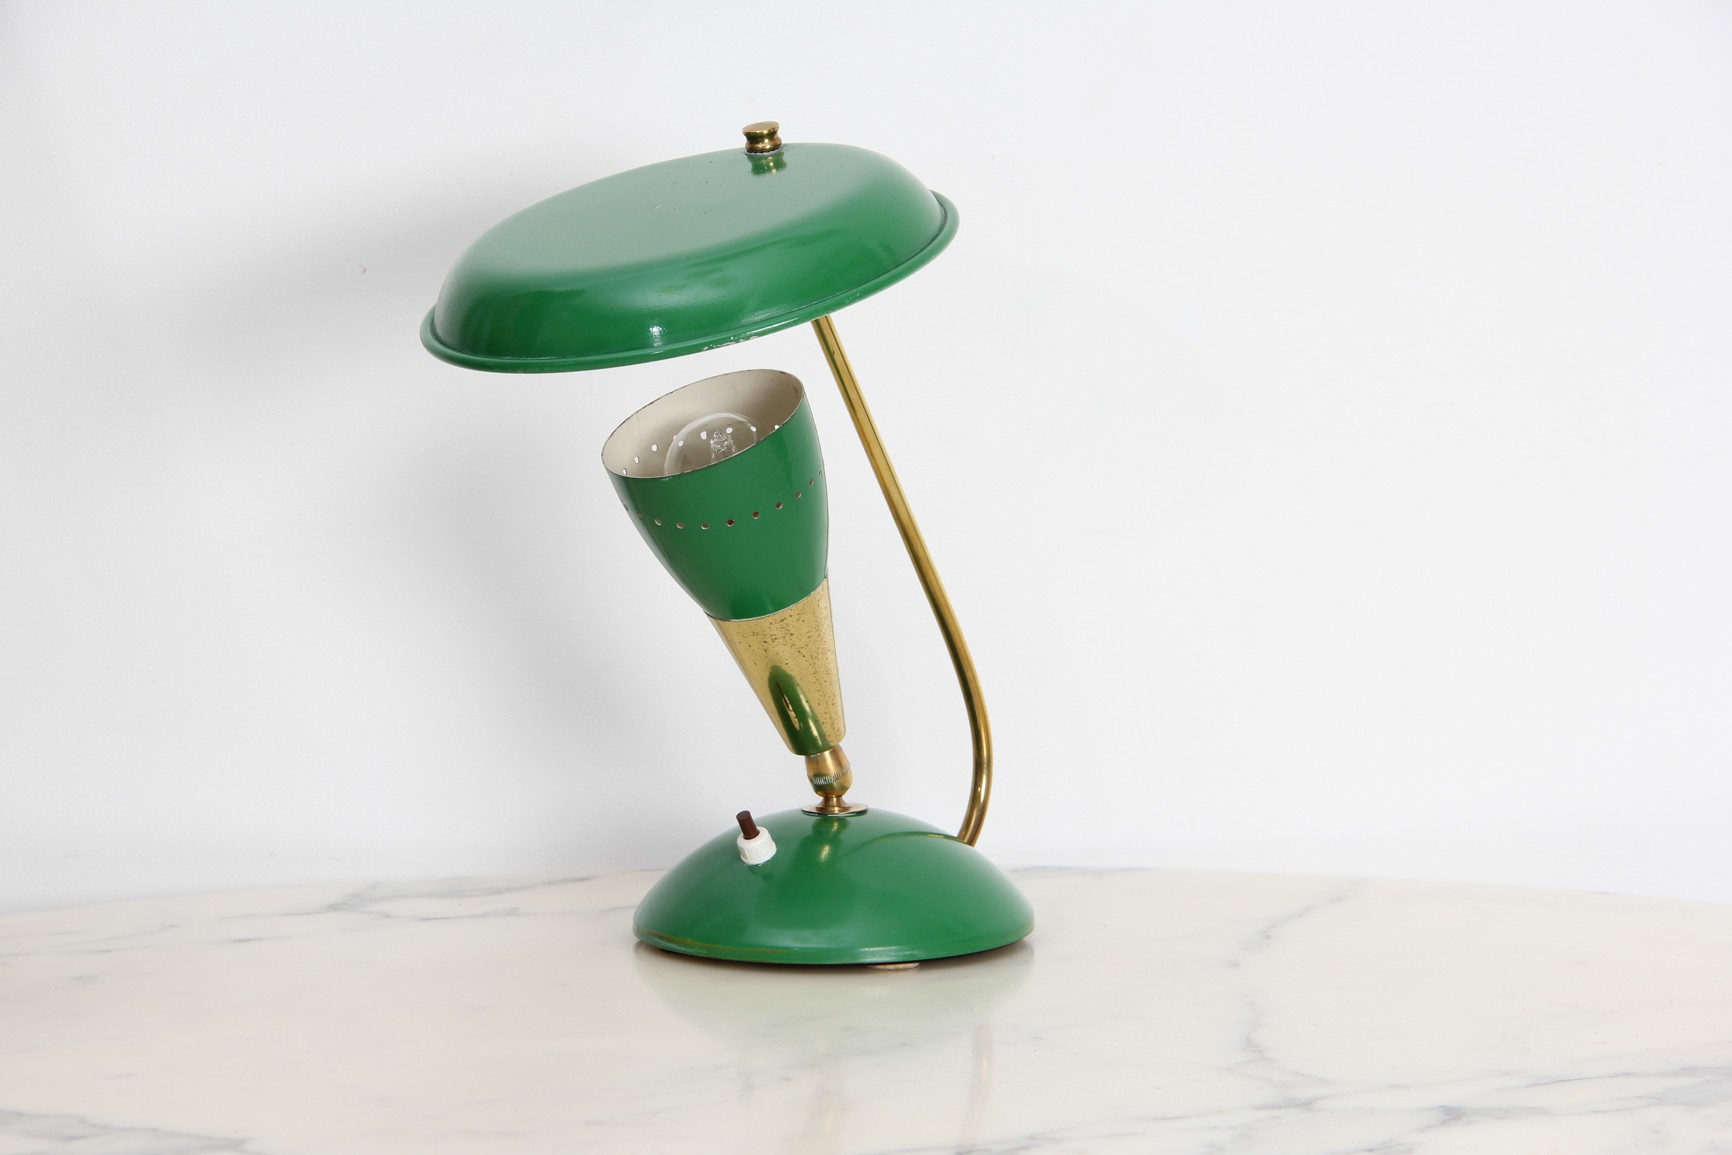 Vintage Green Desk Lamp In Brasetal 1950s Previous Next